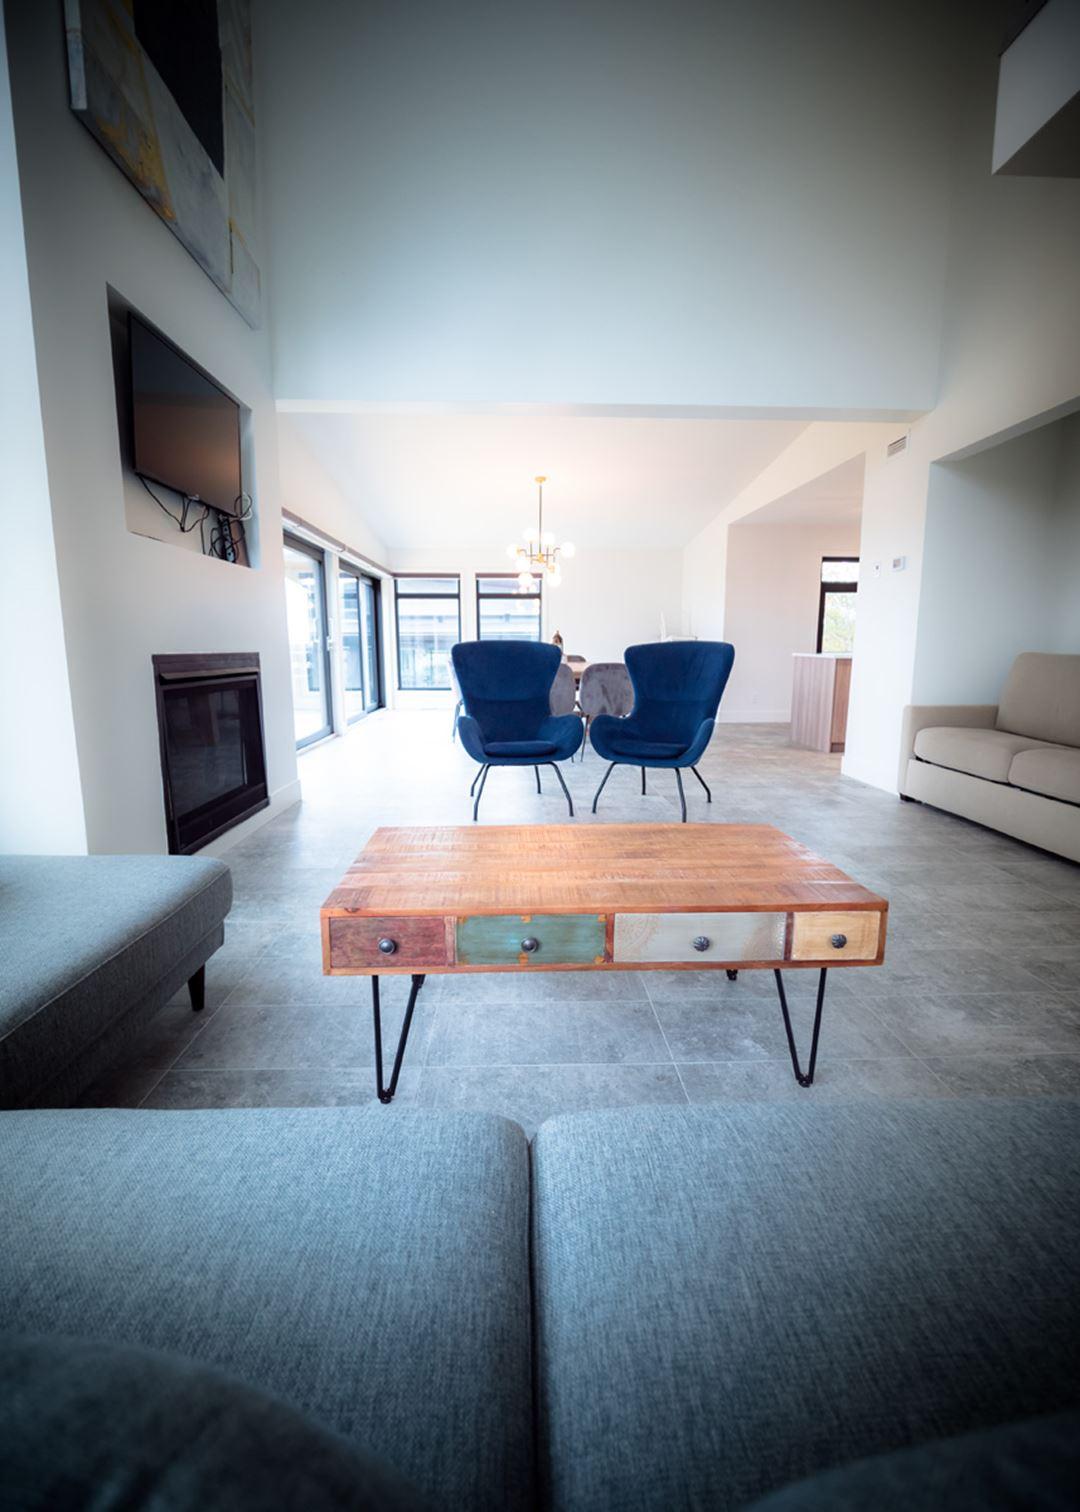 Living room of the cottages of La Montagne Coupée